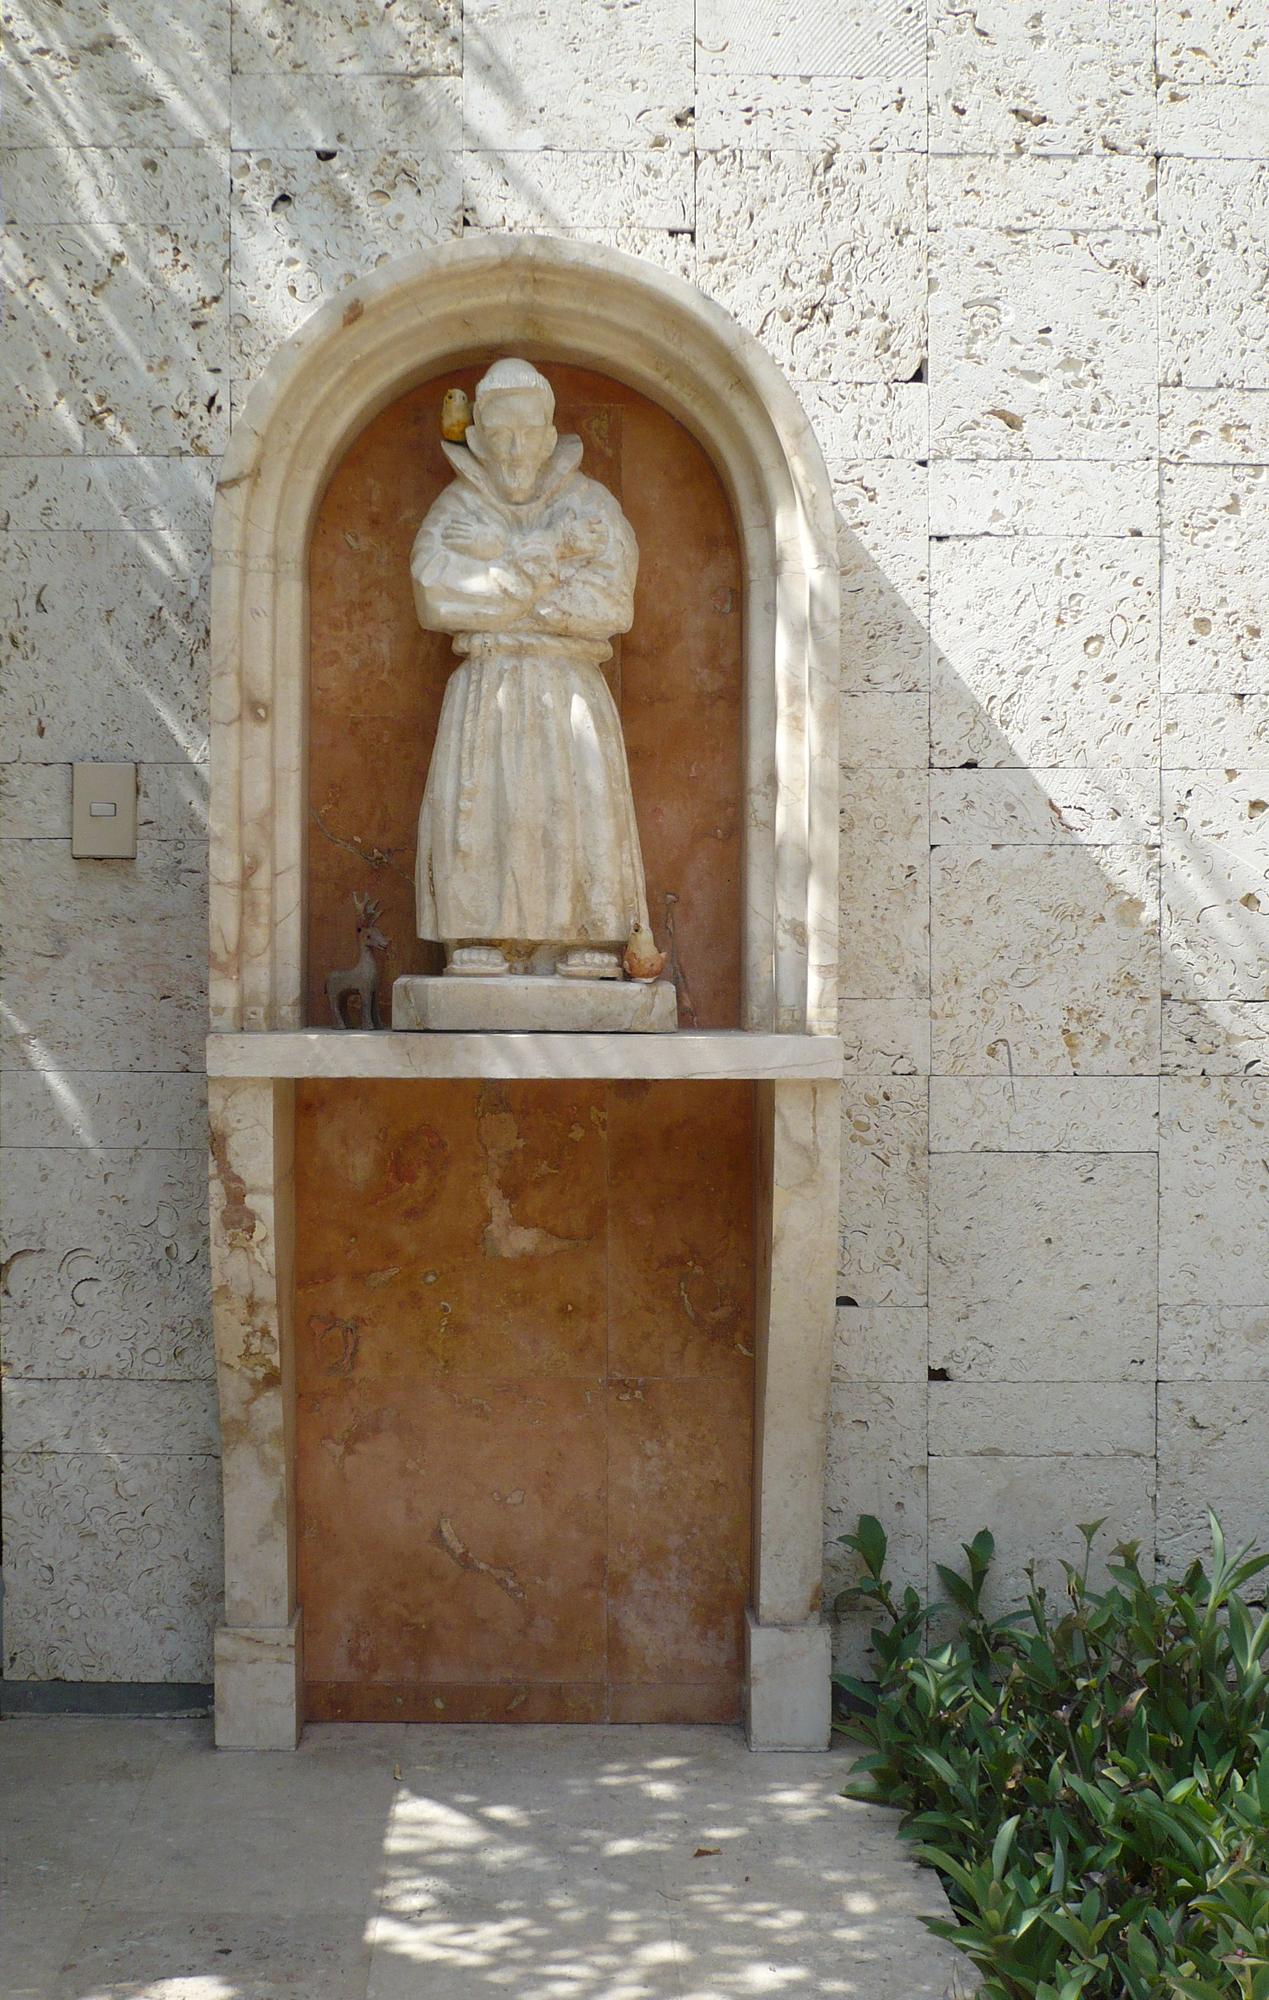 Ostra Wall_St. Francis_1269x2000_P1070601.jpg